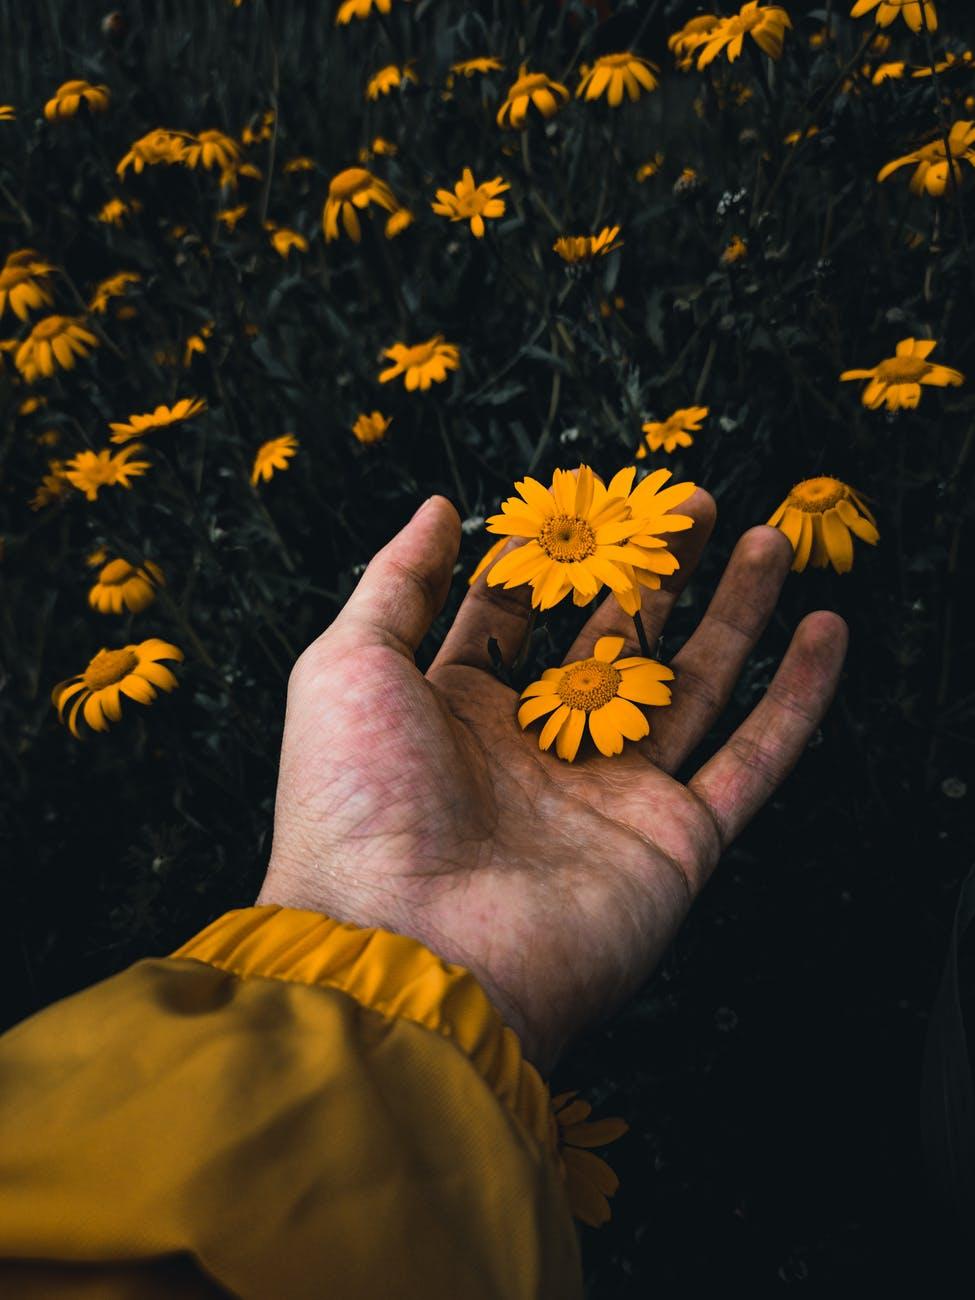 crop person touching yellow wildflowers in garden